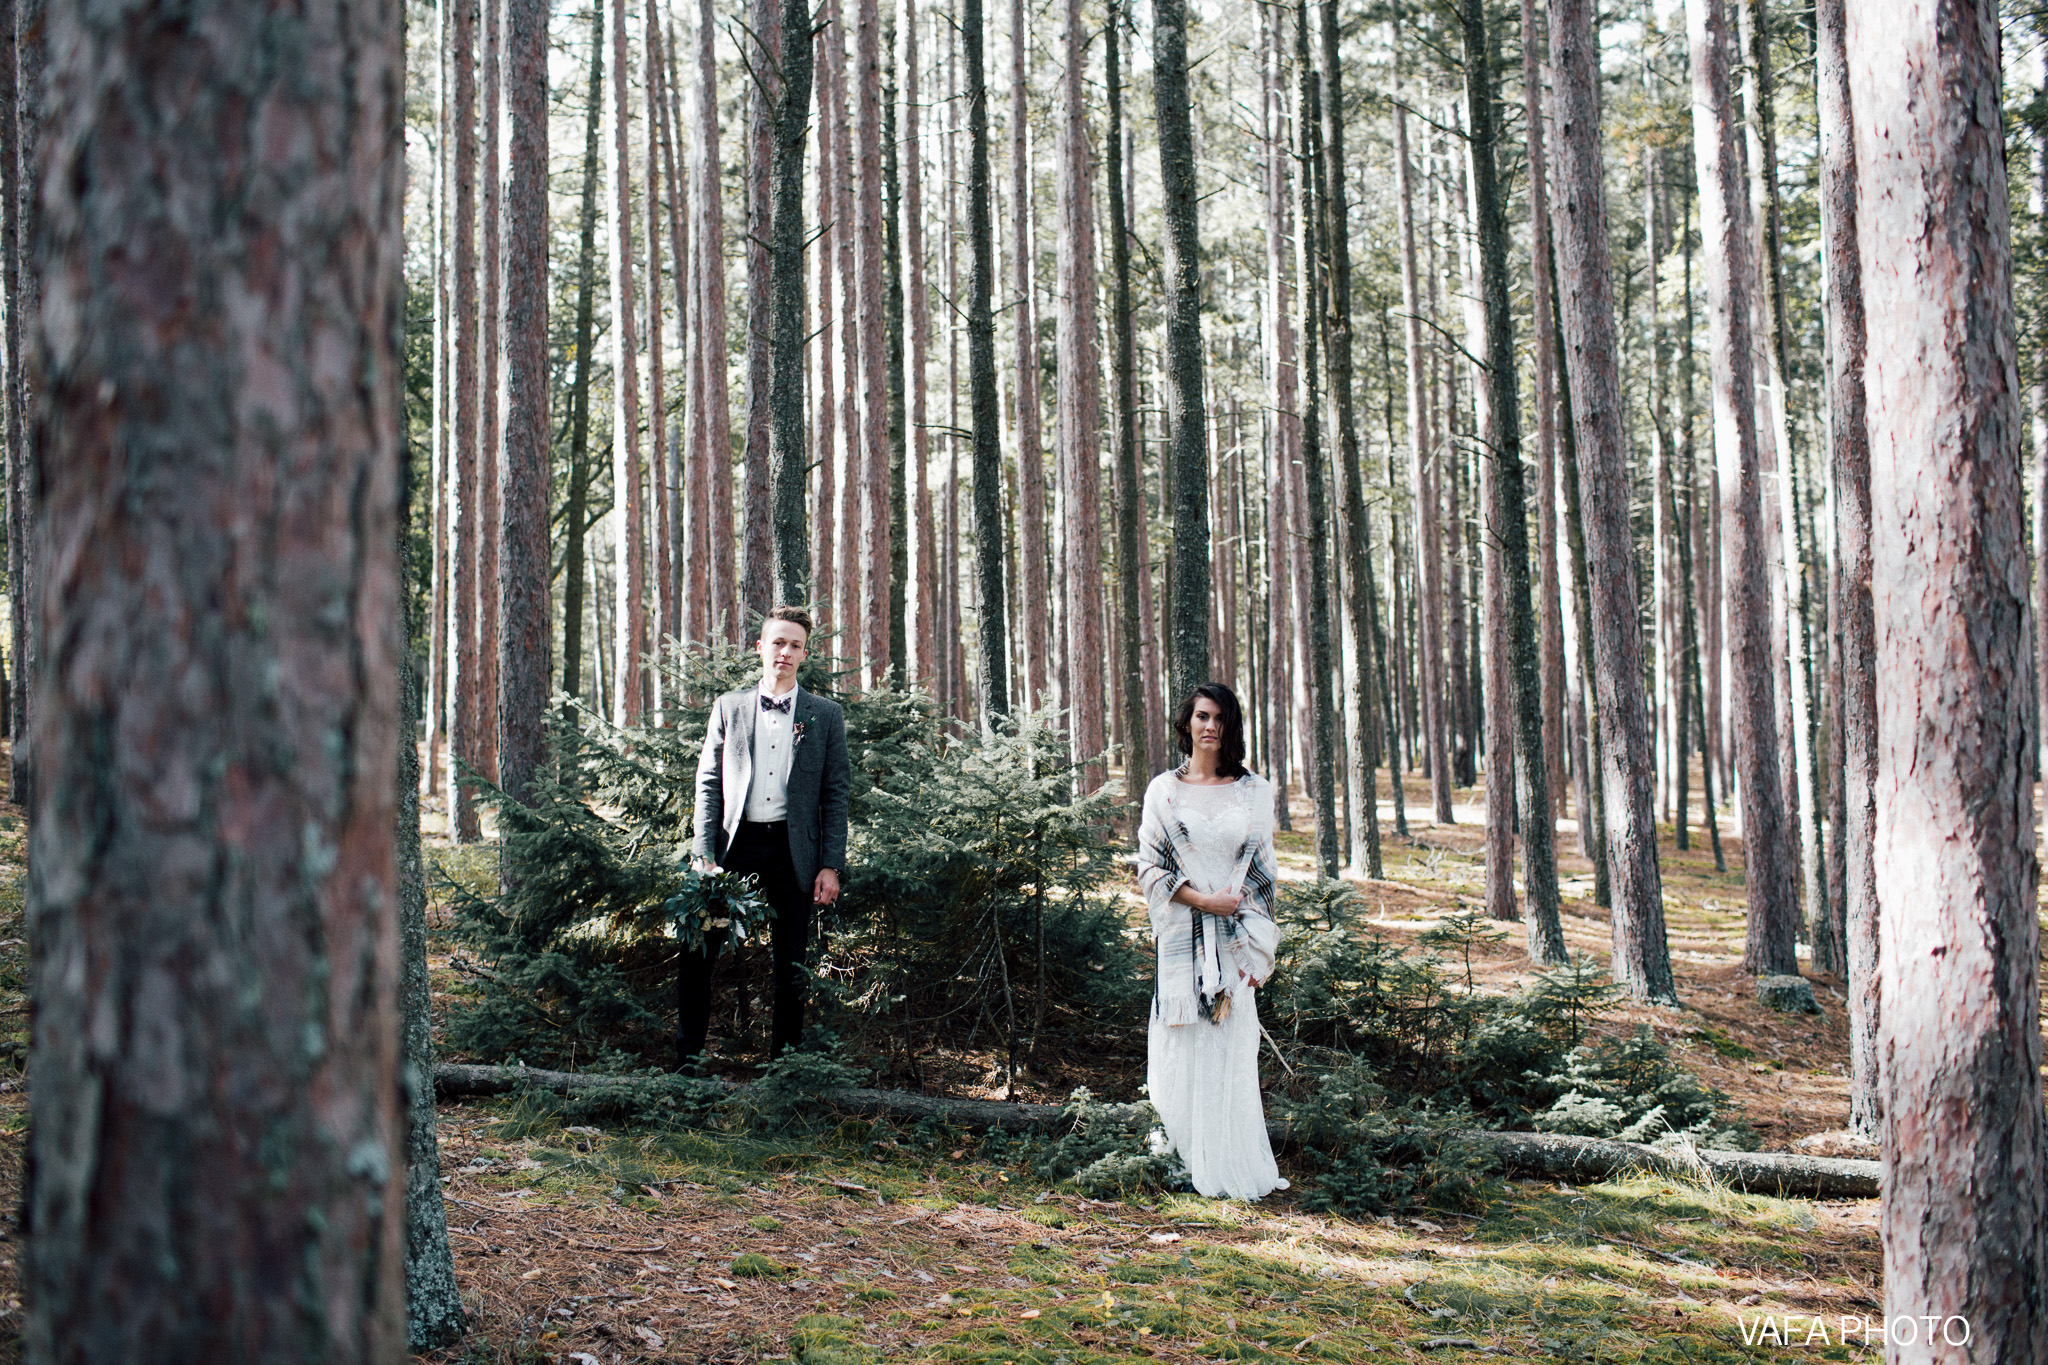 Hogback-Mountain-Wedding-Chelsea-Josh-Vafa-Photo-541.jpg